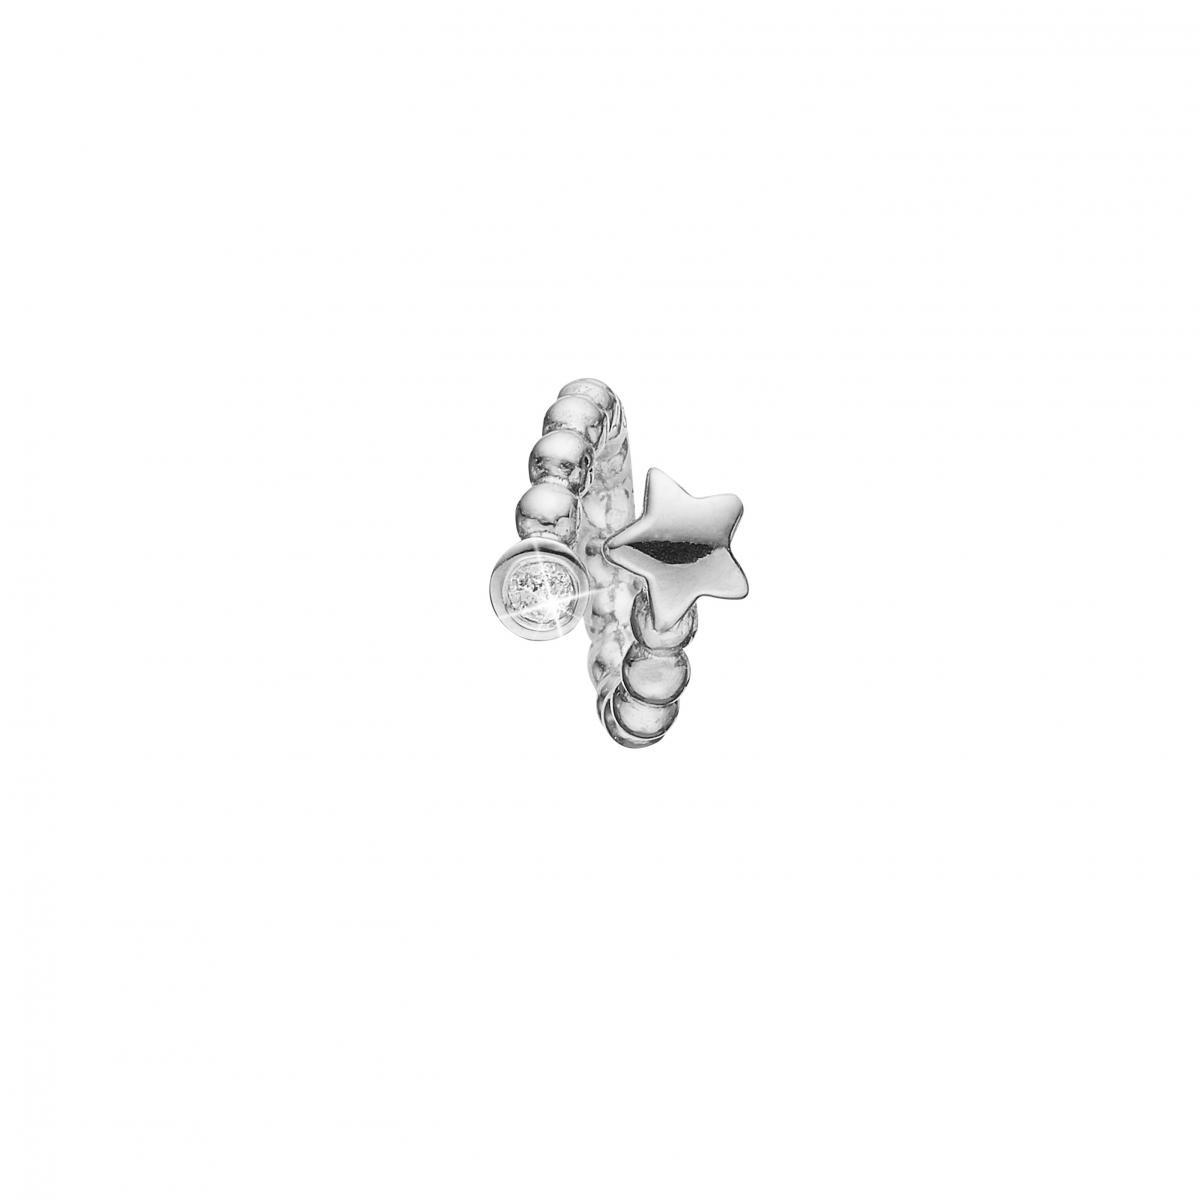 Christina memory sølv charm - 630-S95